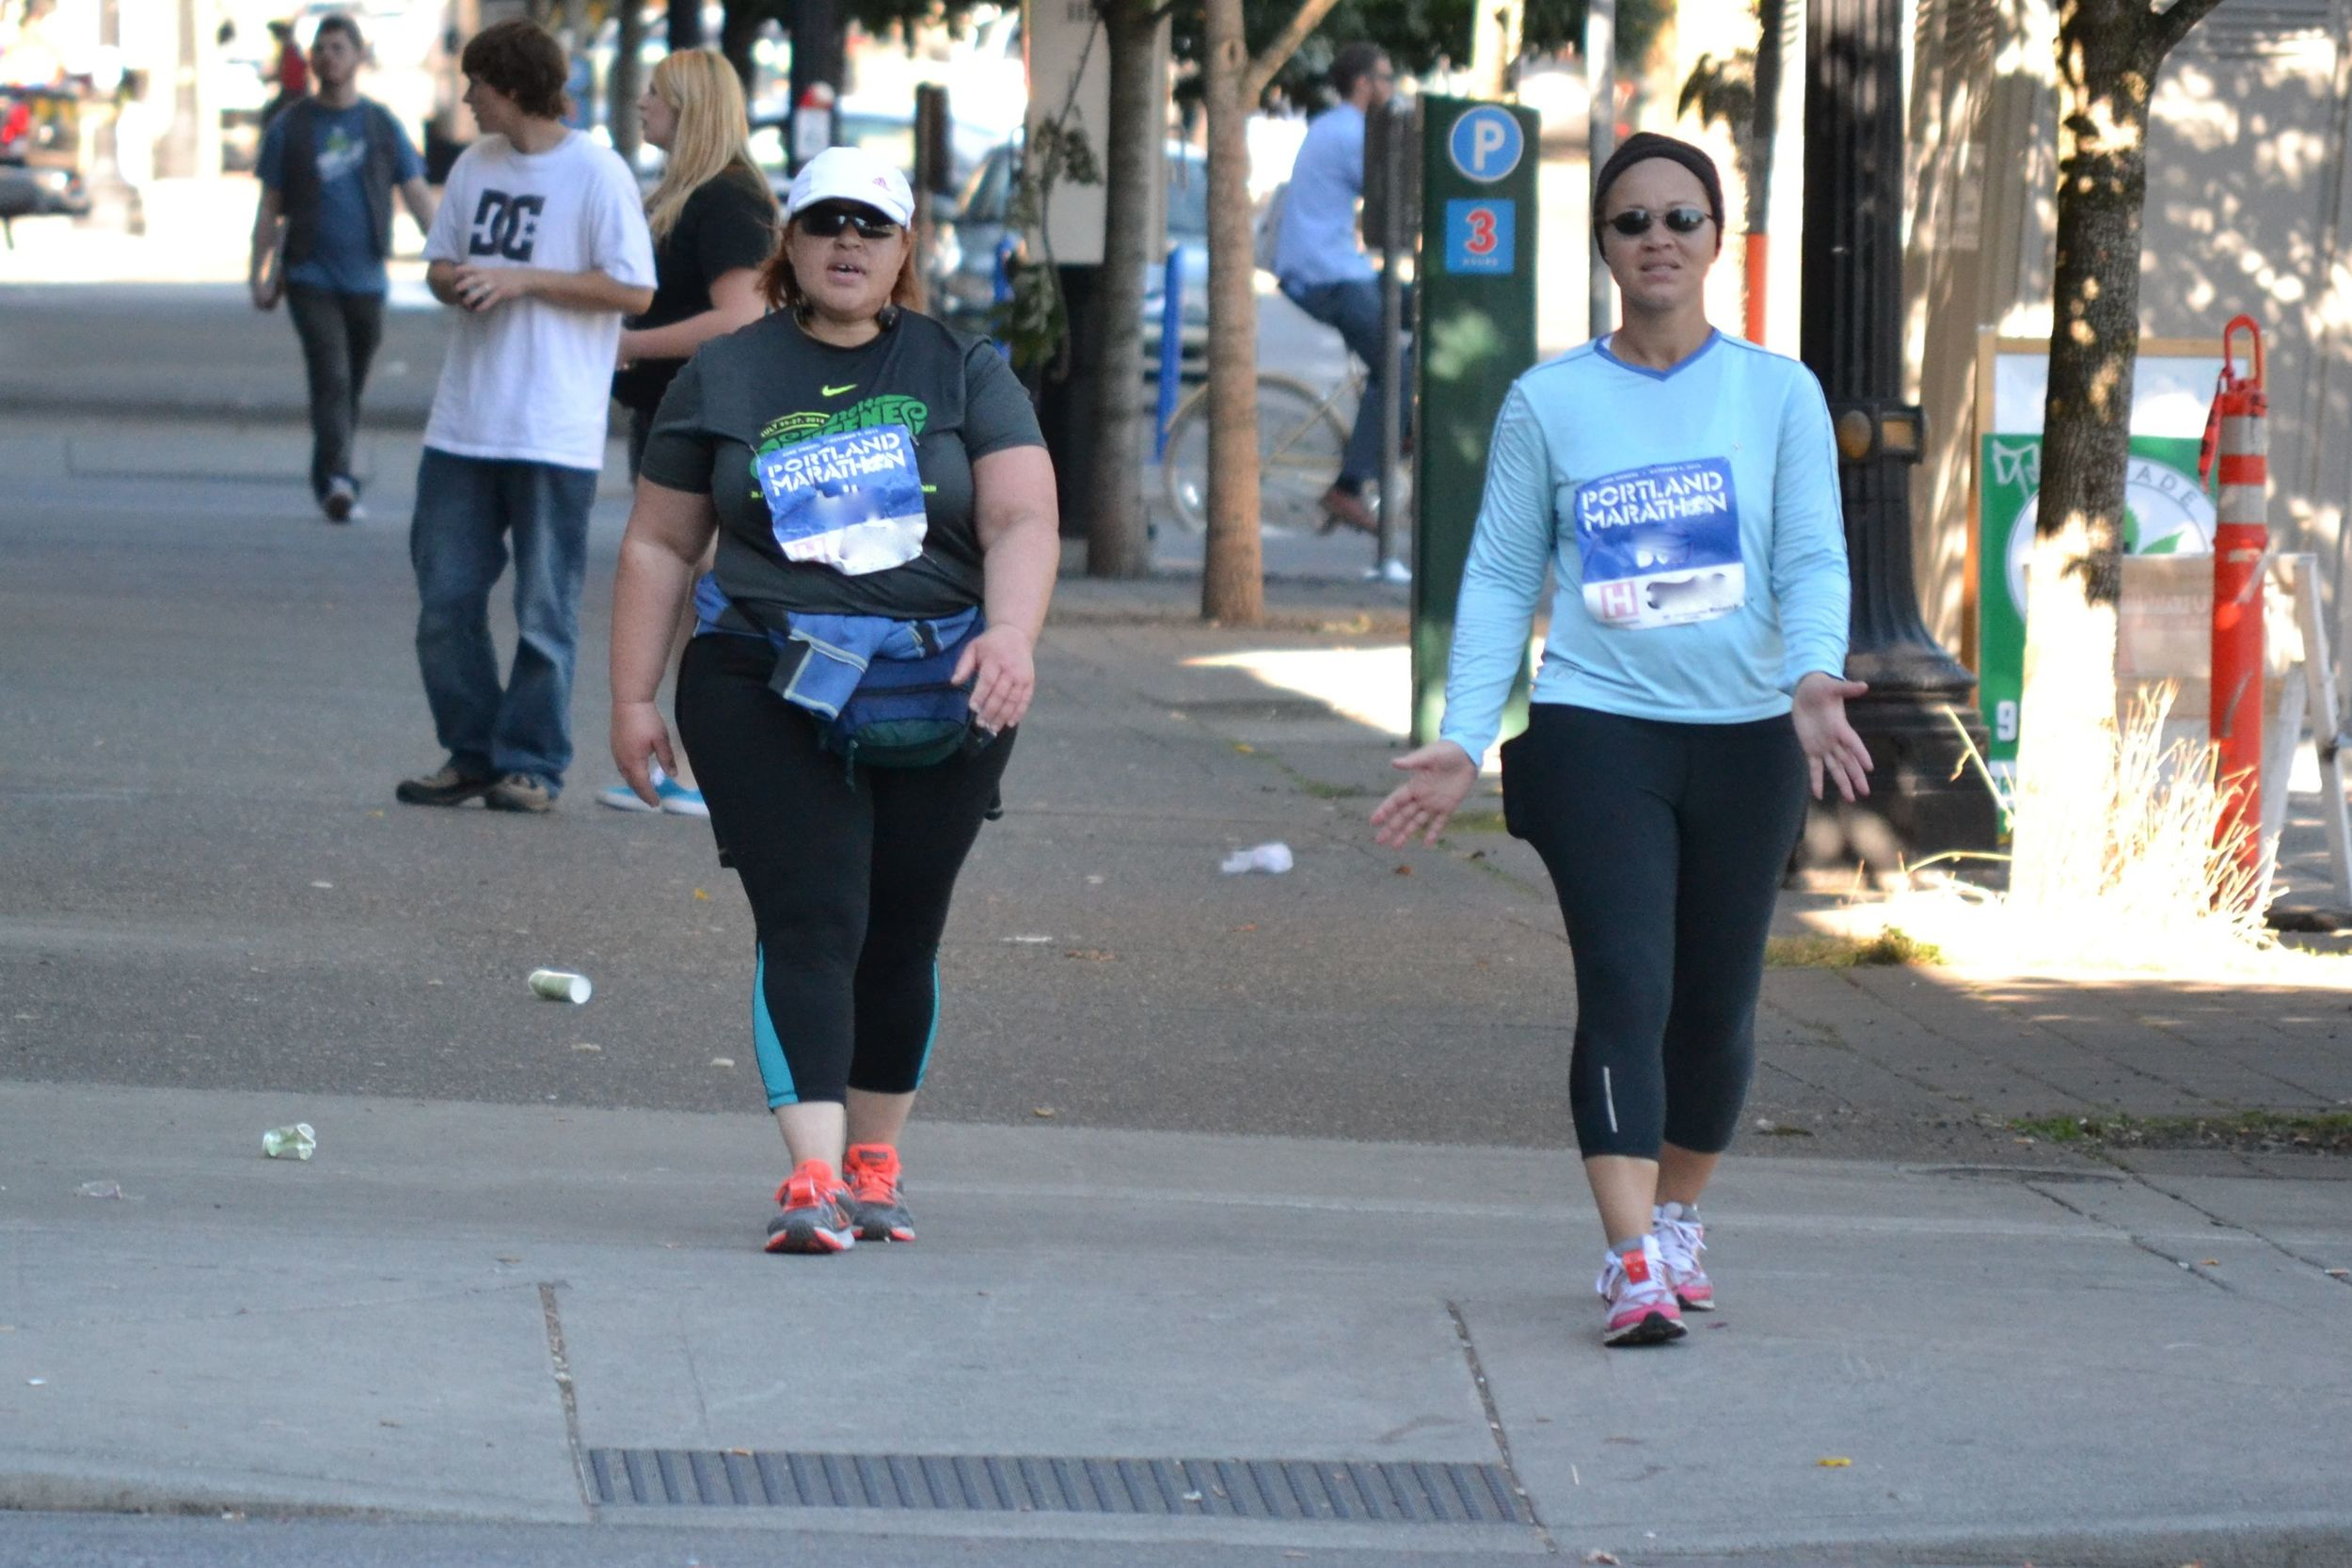 portlandmarathon.anitasis